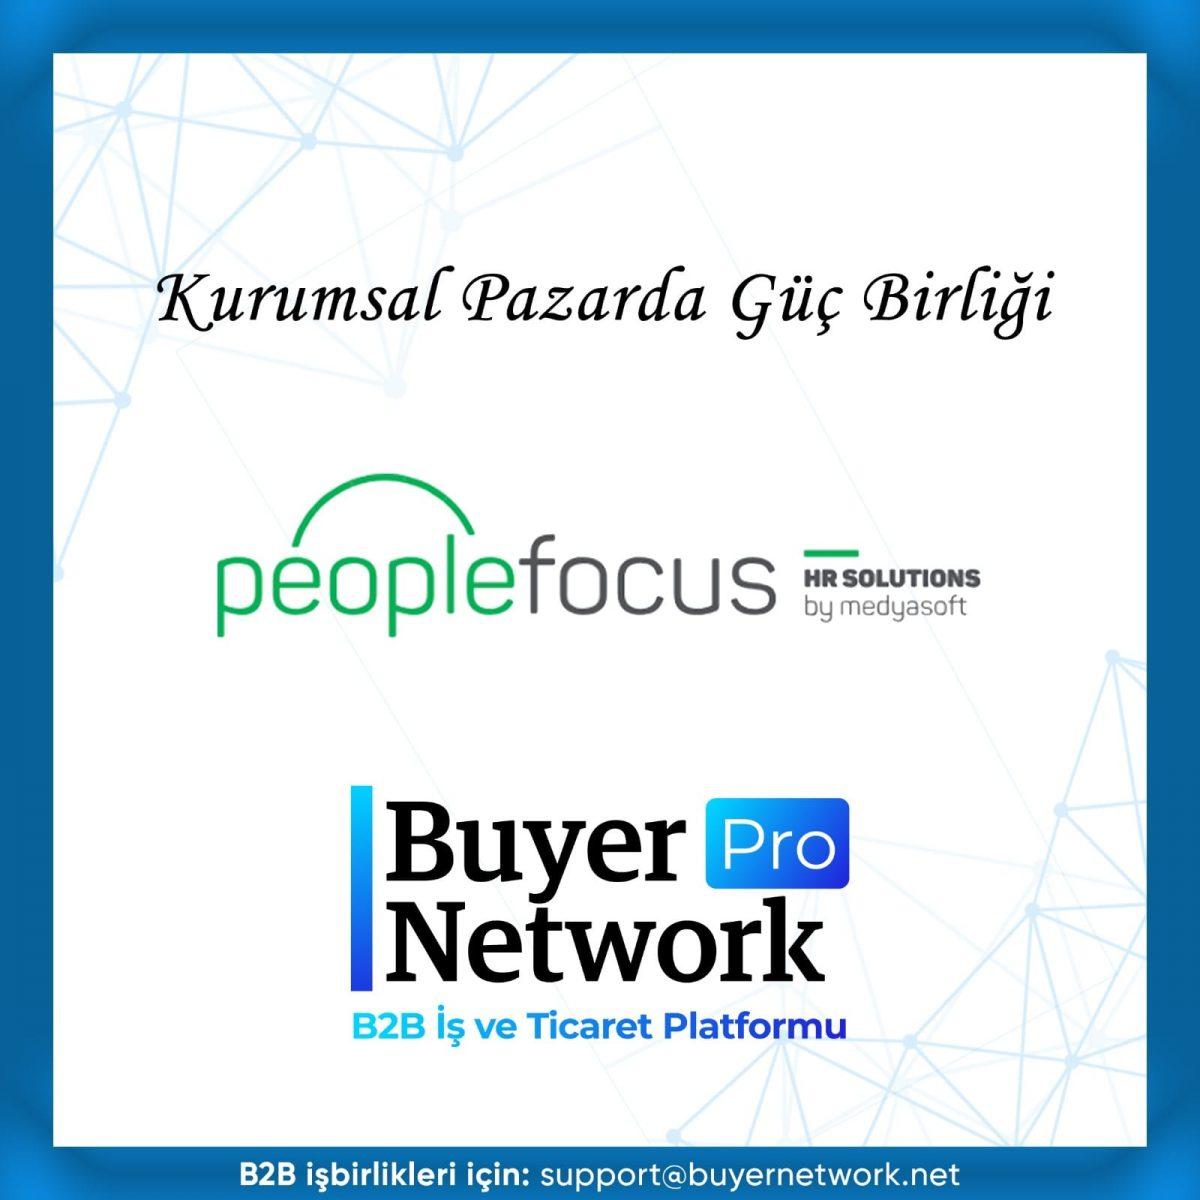 People_focus_buyer_network-1200x1200.jpeg